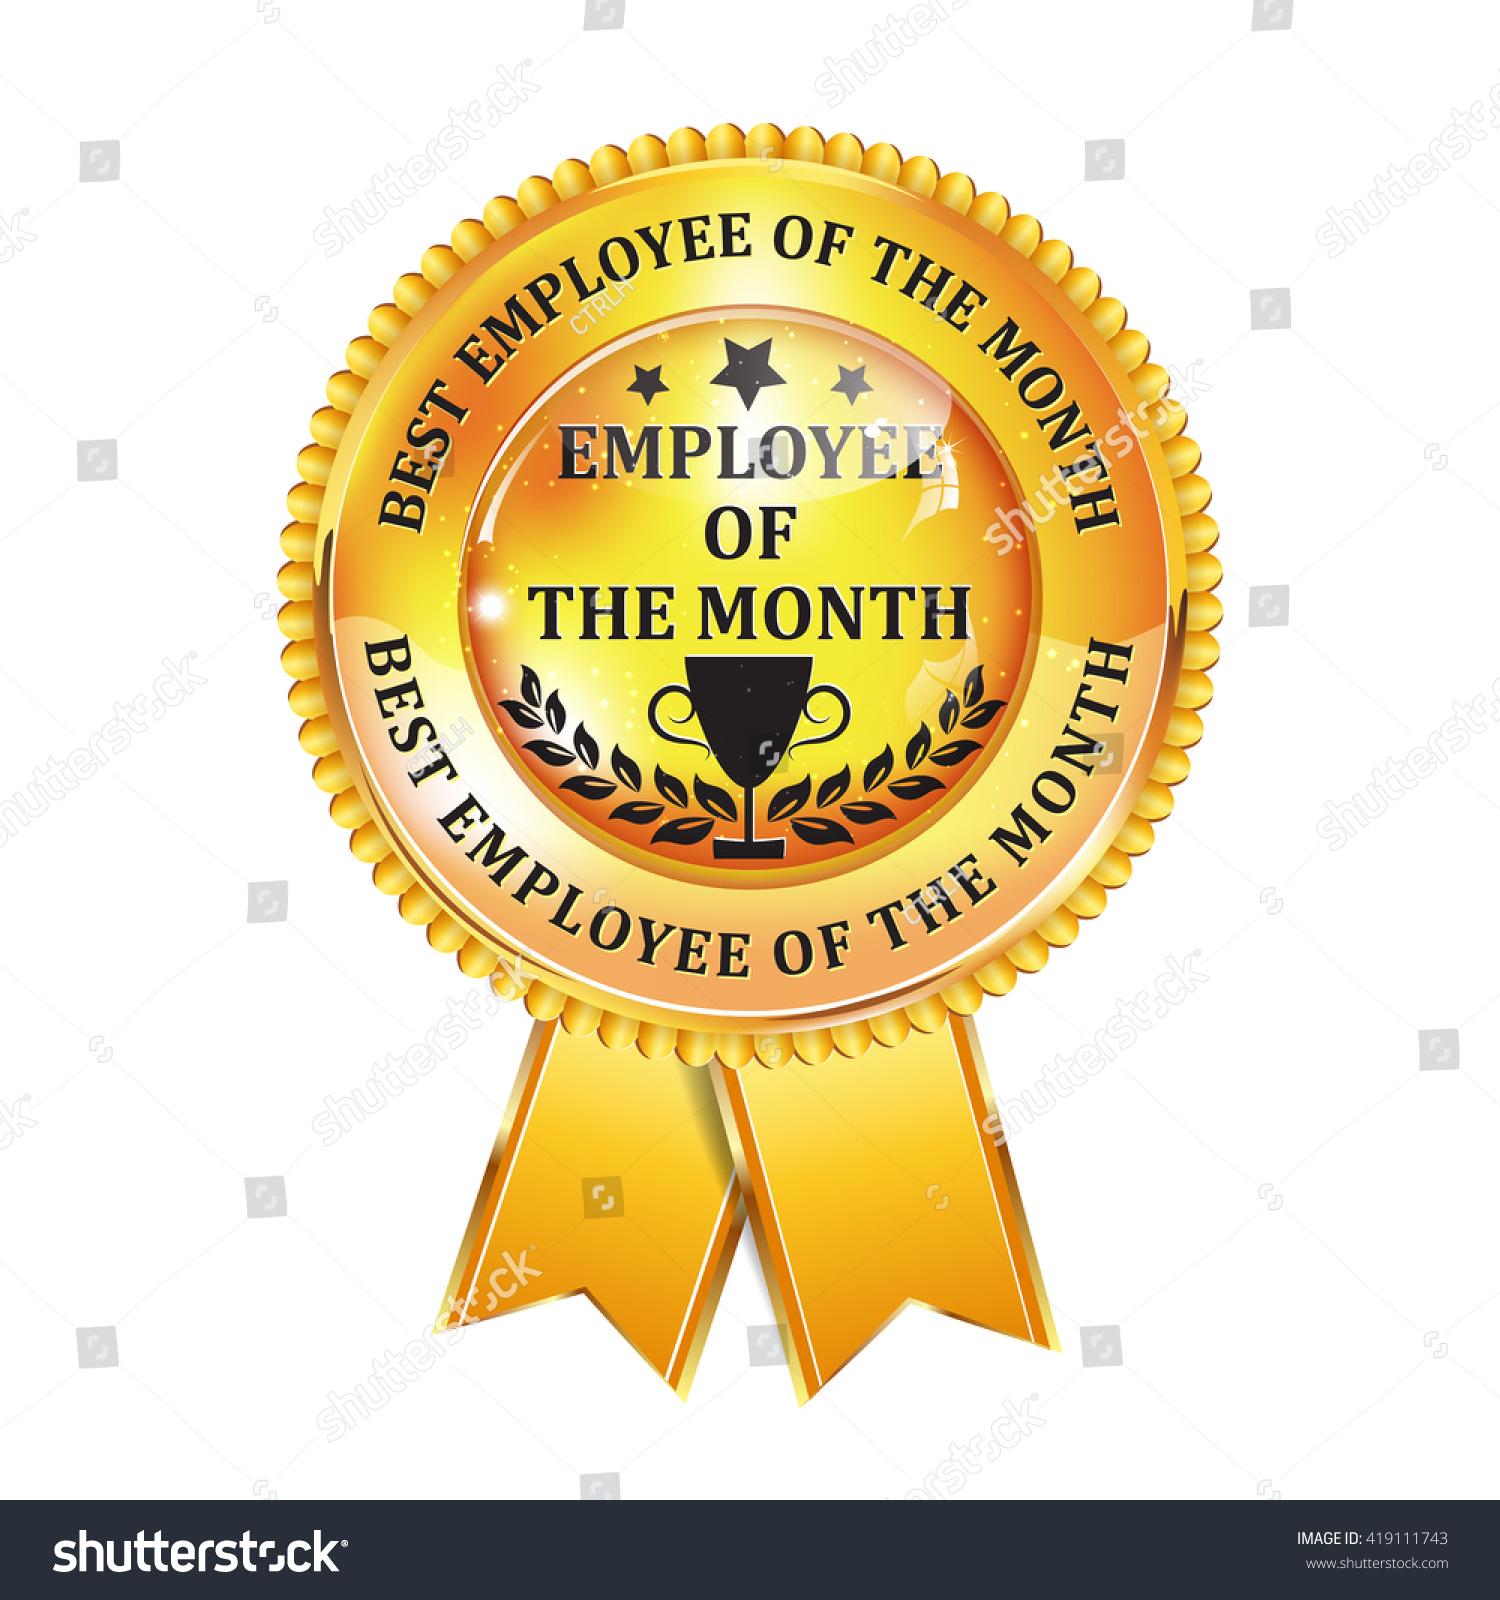 employee of the month elegant golden black award ribbon - Employee Of The Month Award